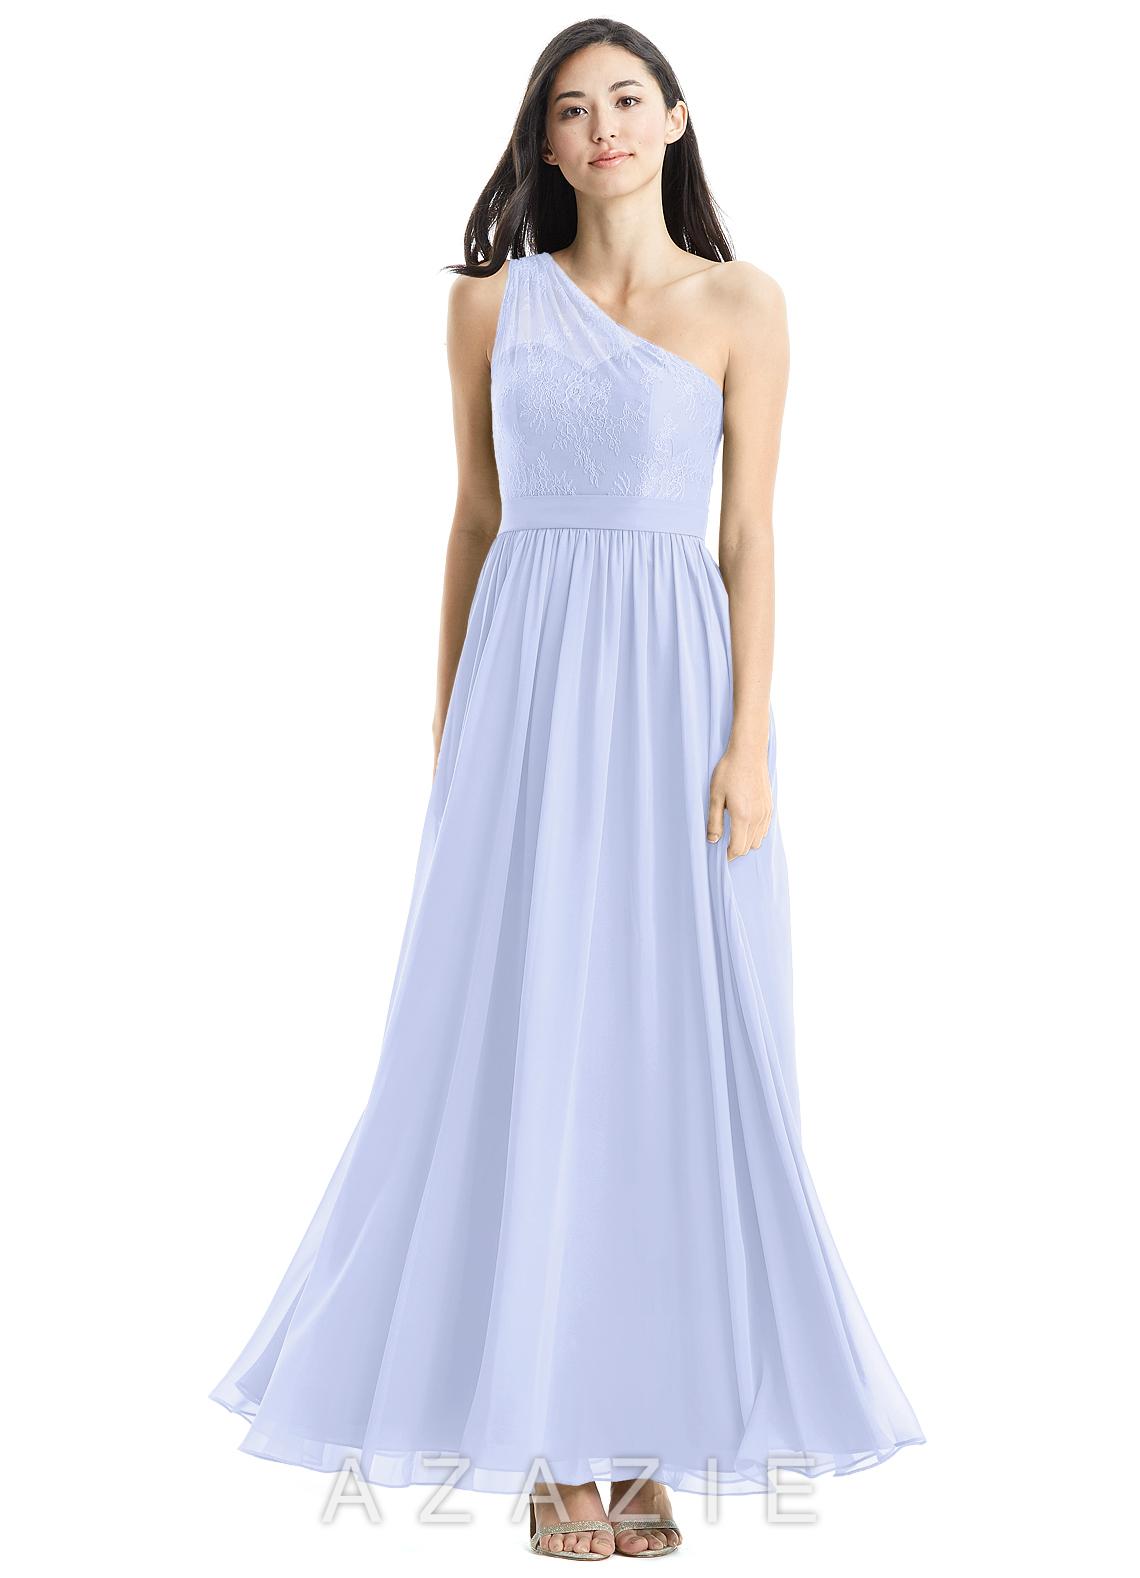 Azazie Rochelle Bridesmaid Dress | Azazie - photo #17